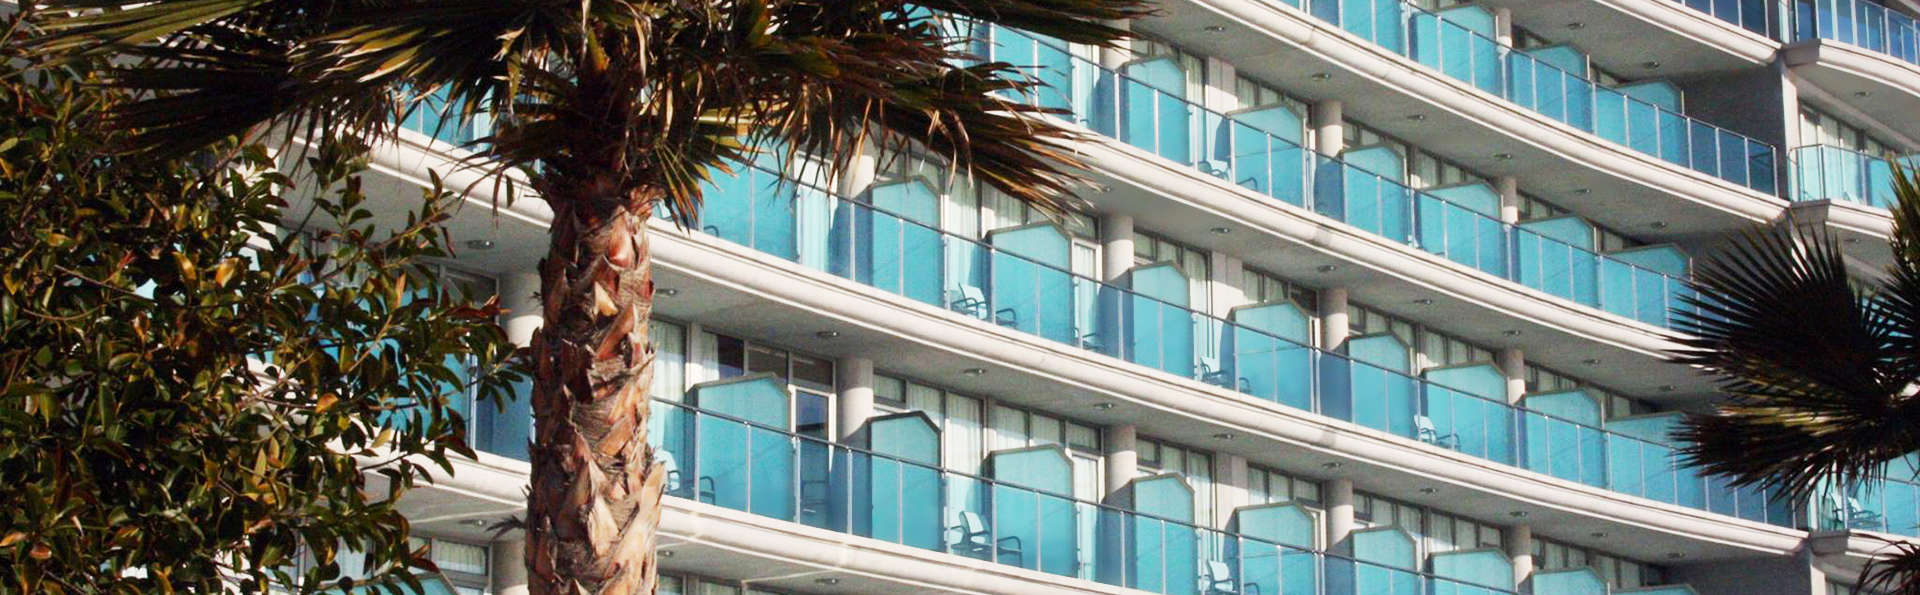 Hotel Allon Mediterrània - EDIT_front.jpg